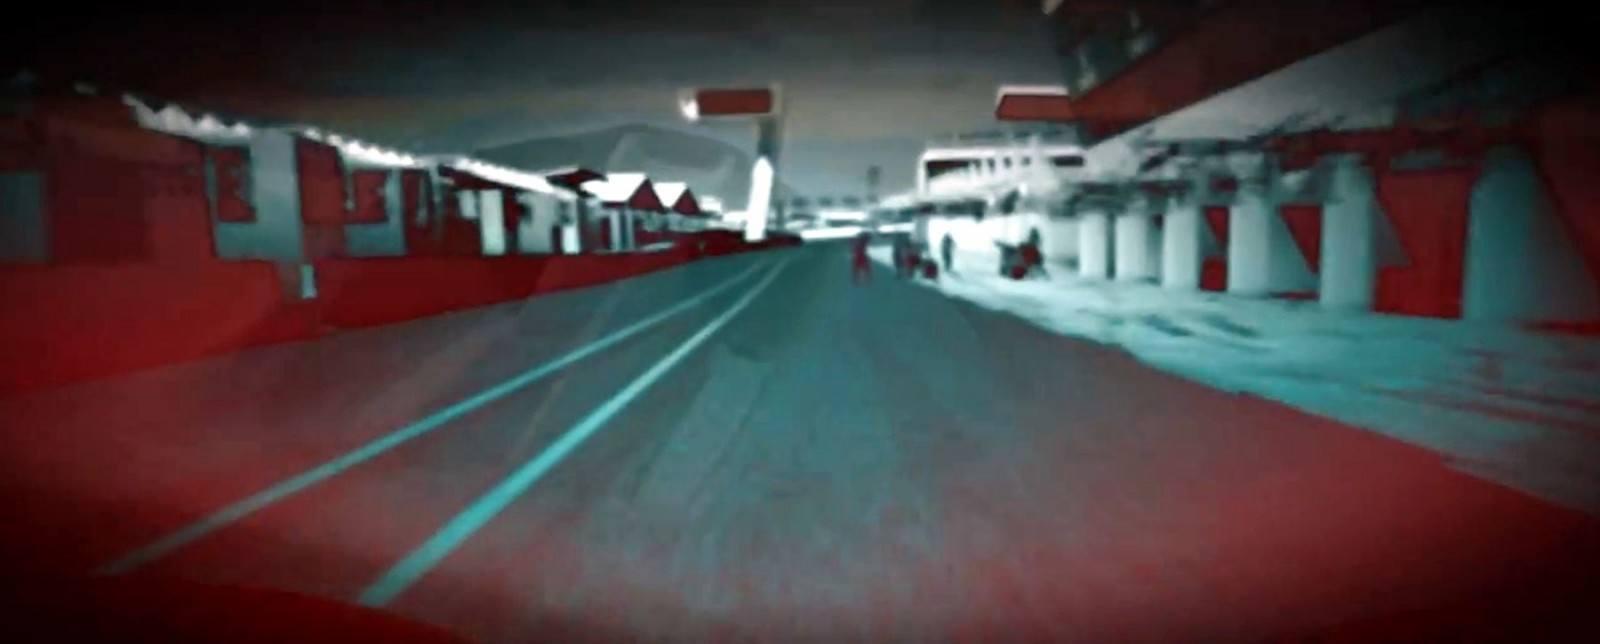 2015 SRT Tomahawk Vision Gran Turismo 8